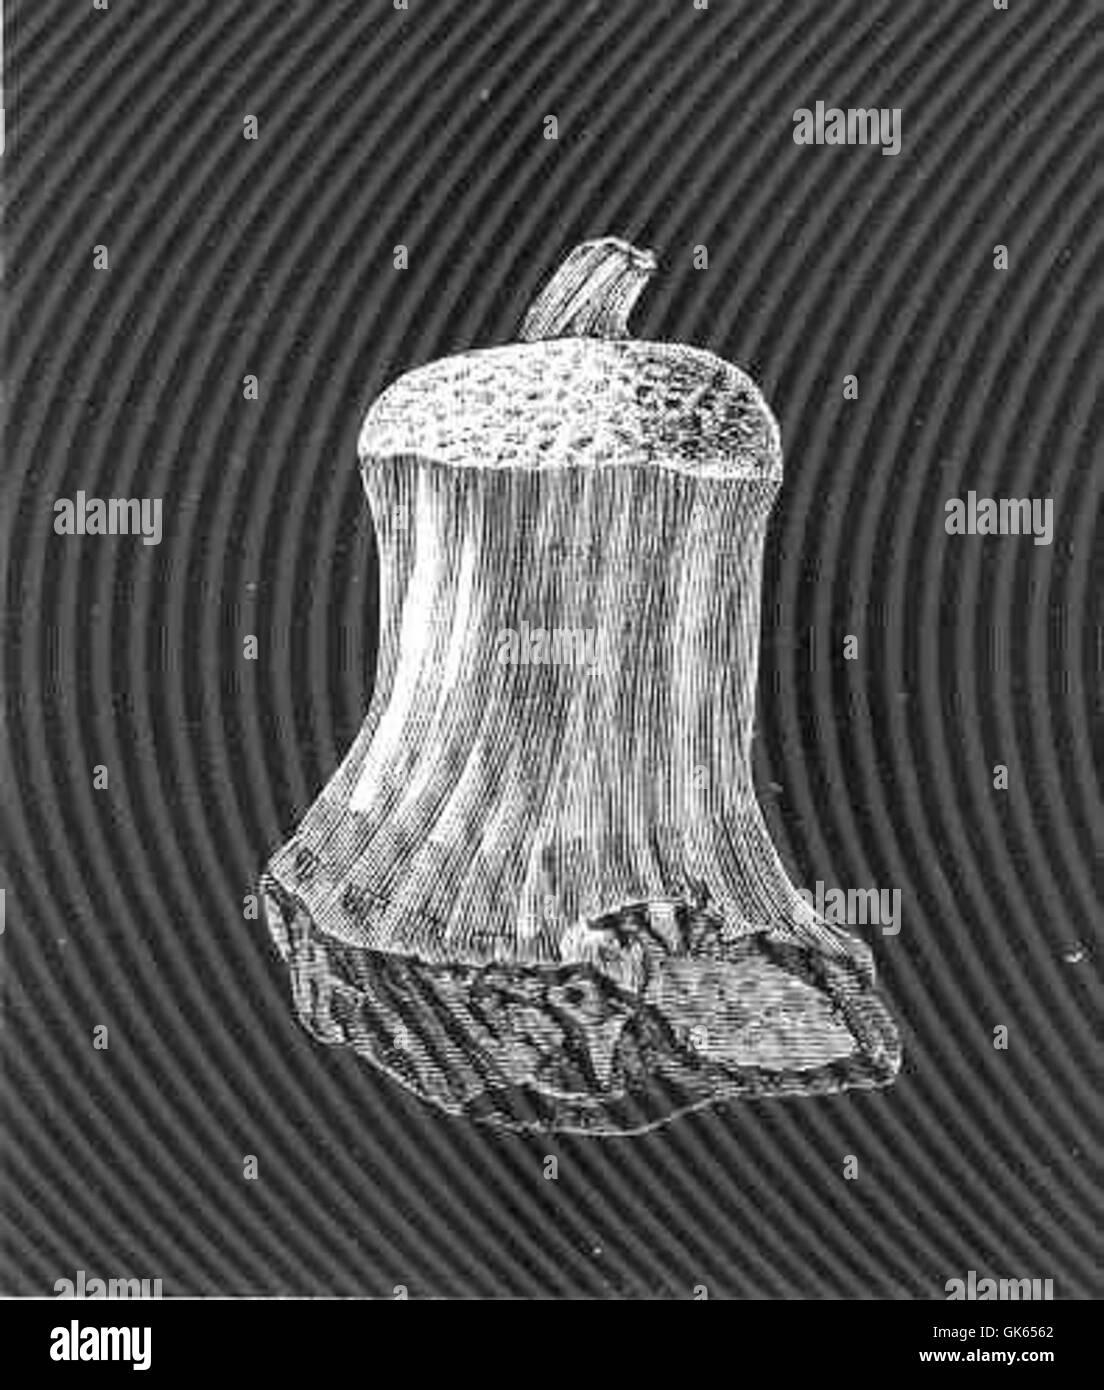 49291 Theophora scmisuberites, Oscar Schmide